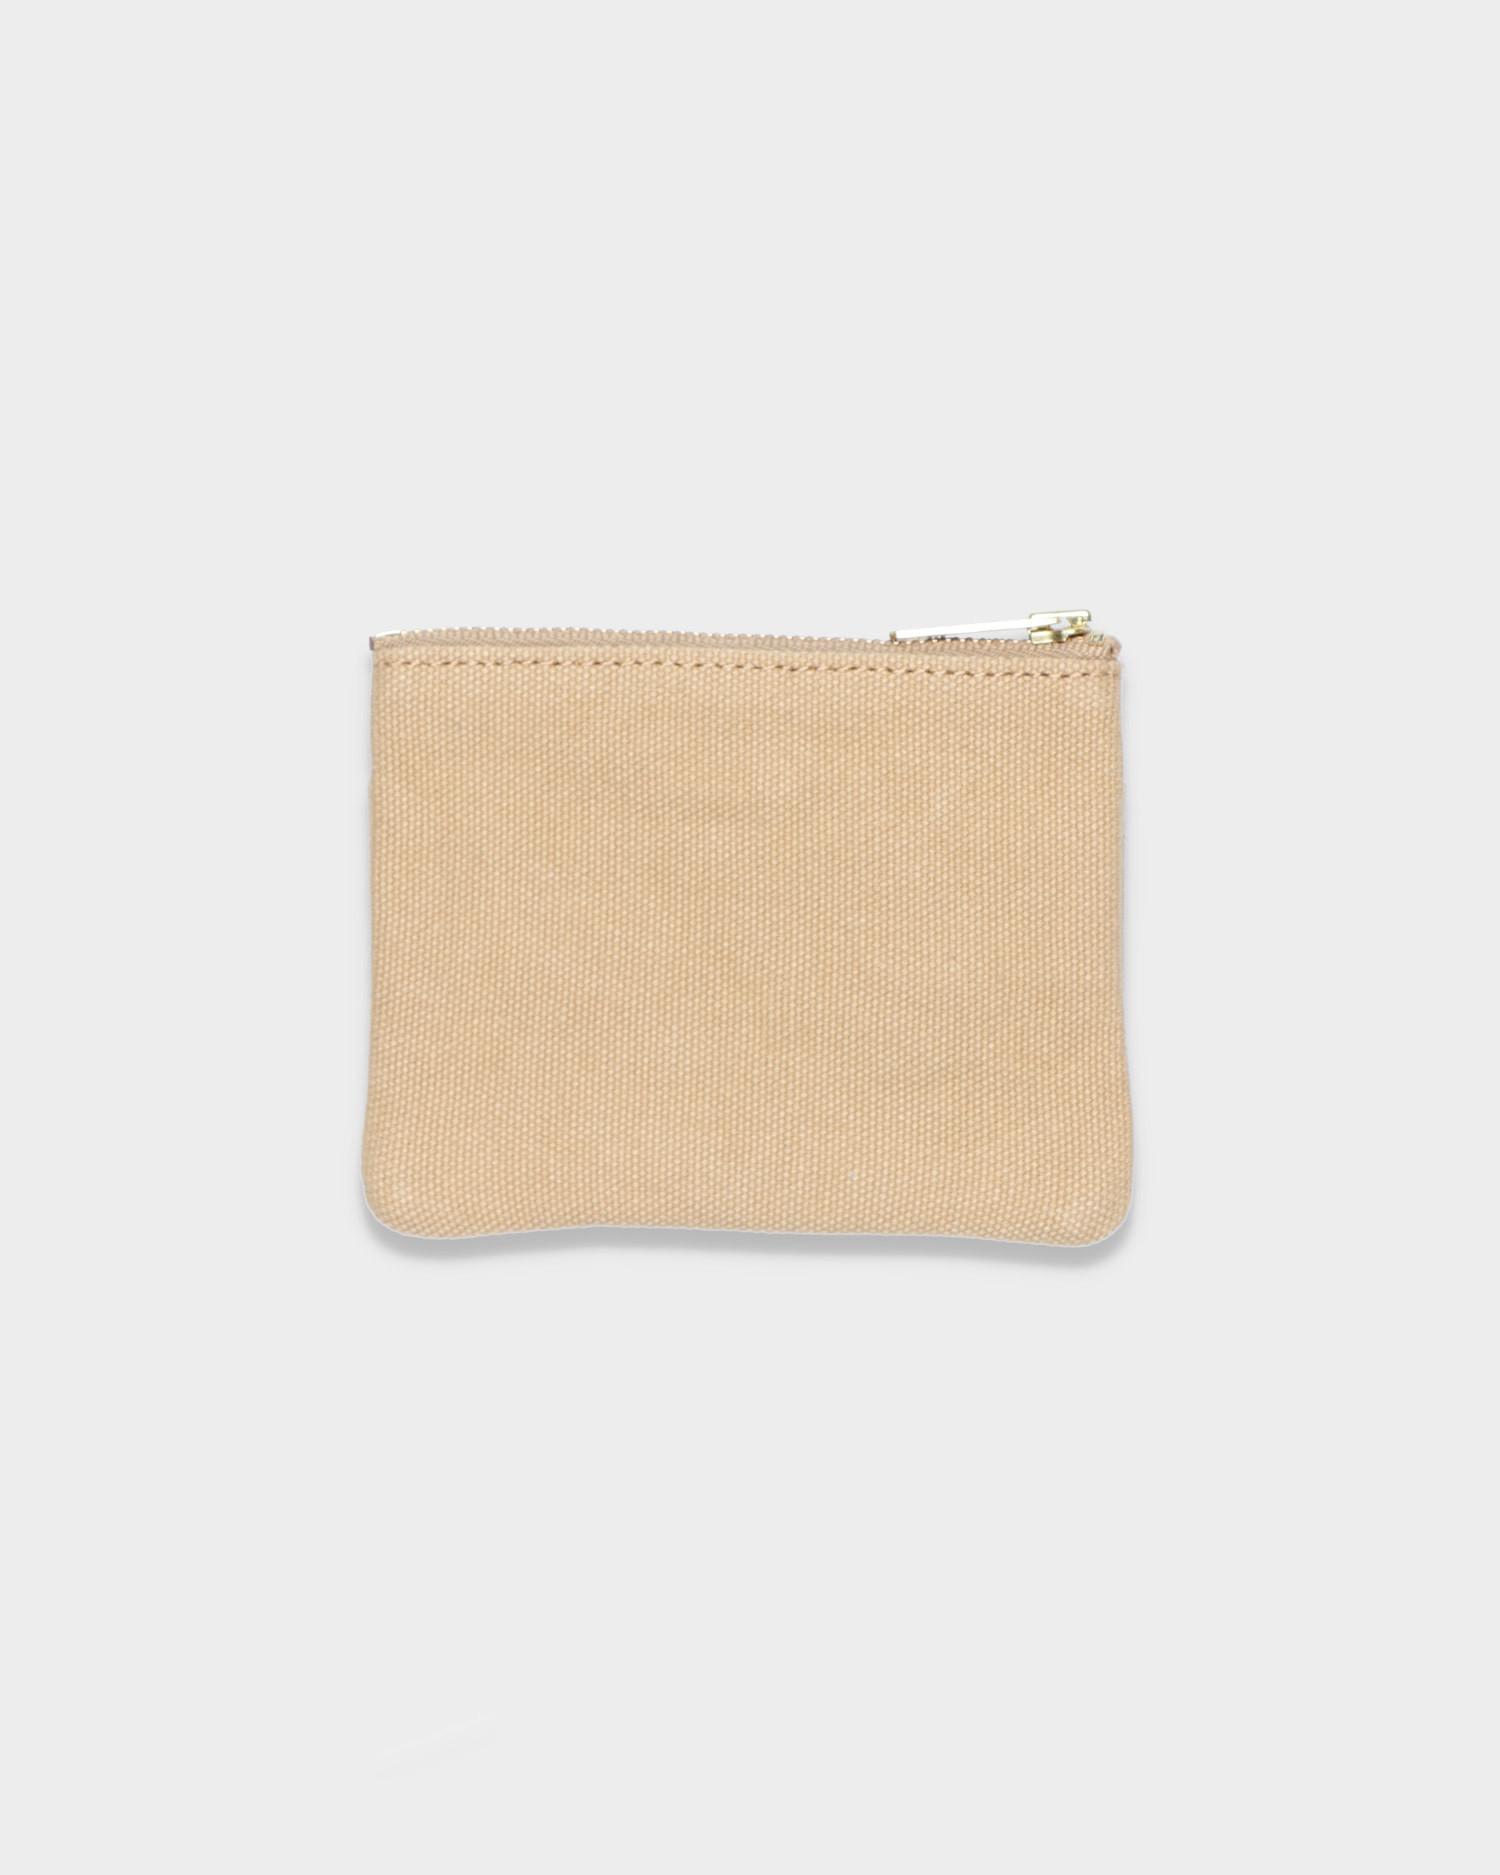 Carhartt Canvas Wallet Dusty H Brown/Black